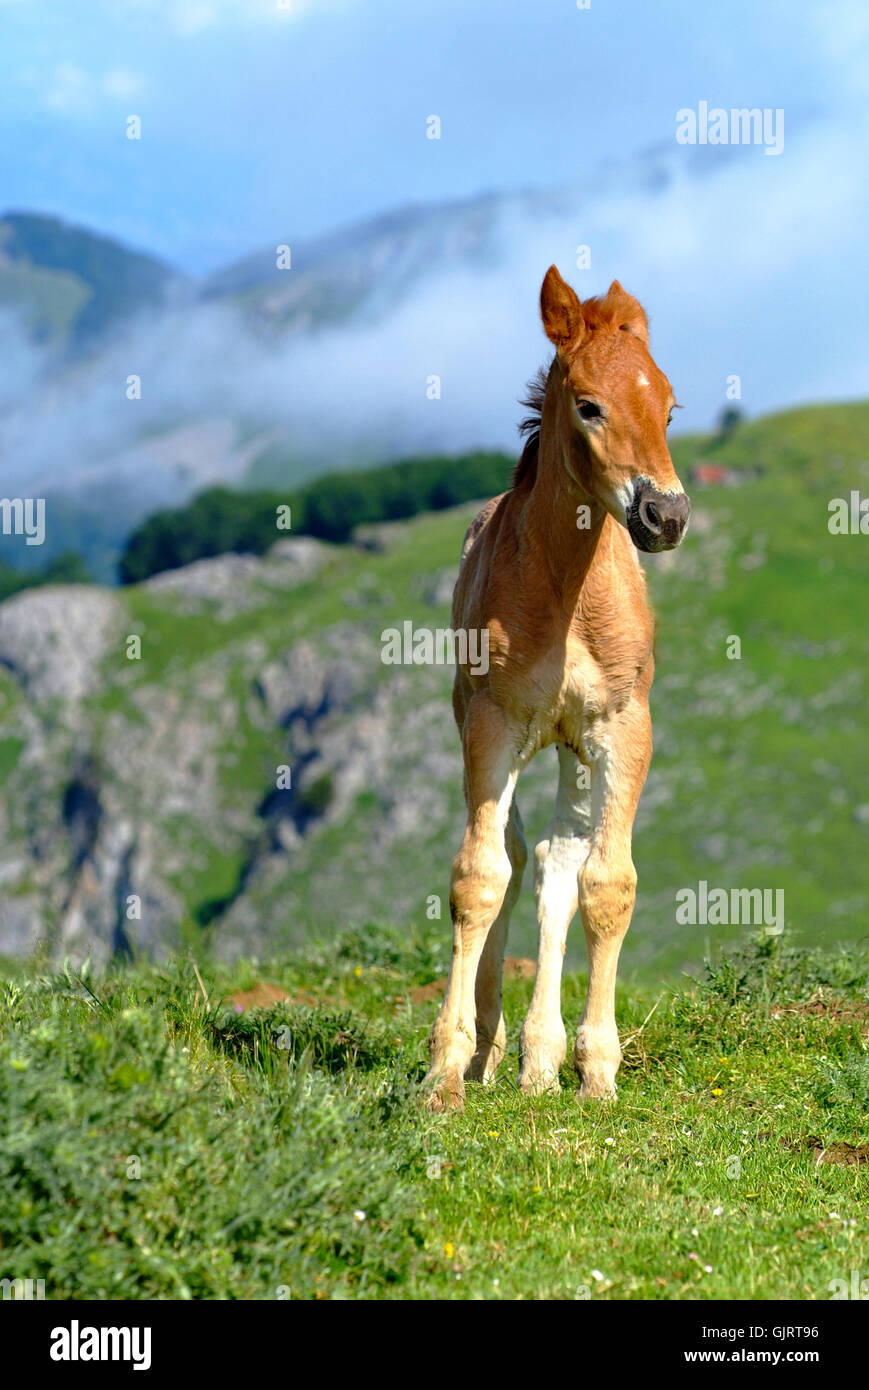 Ternura caballo colt Imagen De Stock